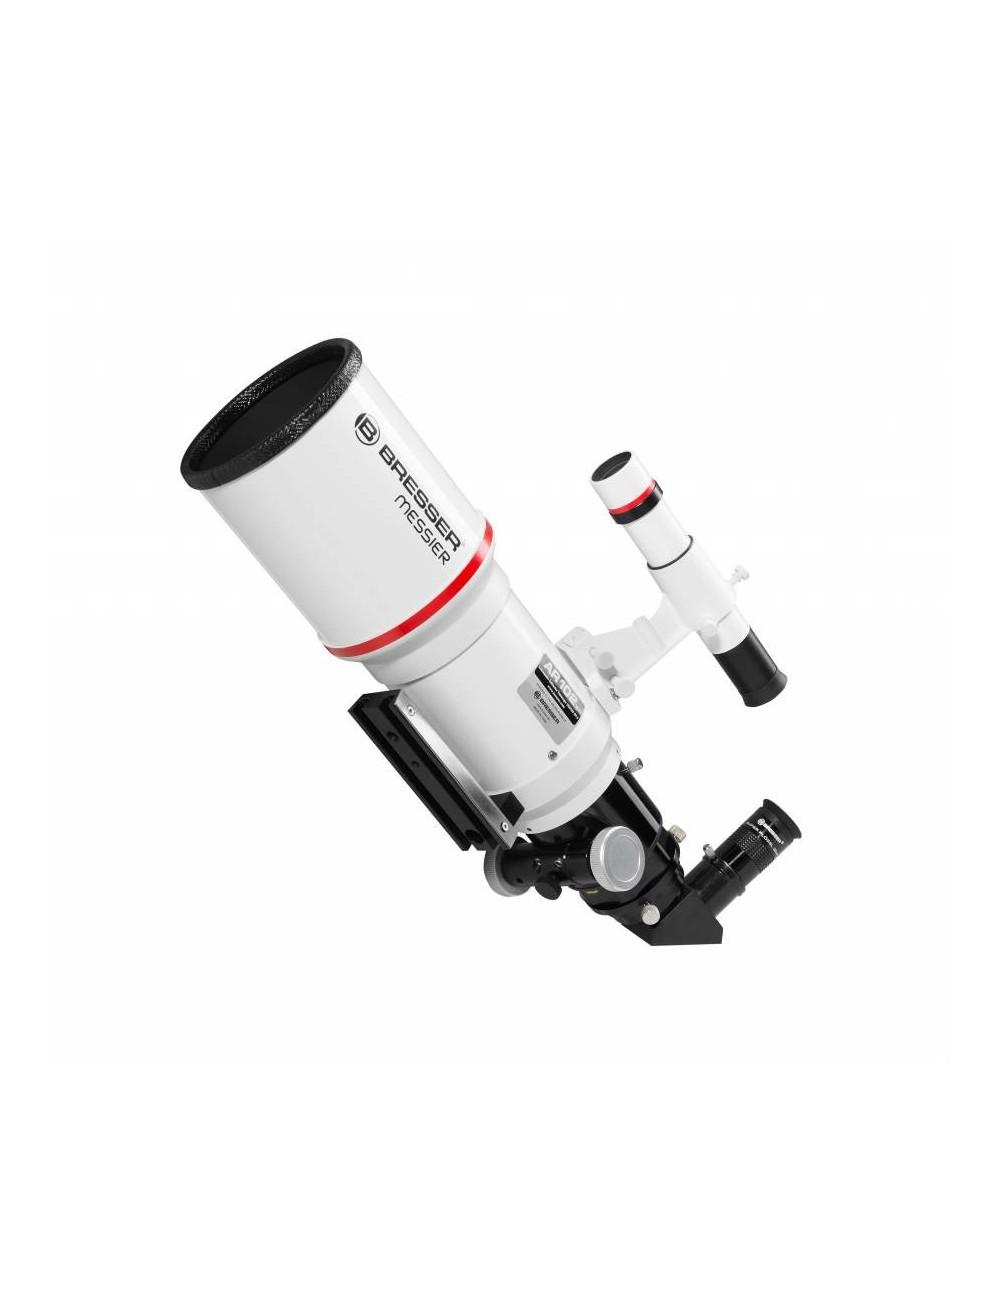 Tube optique Bresser Messier AR-102XS/460 Hexafoc